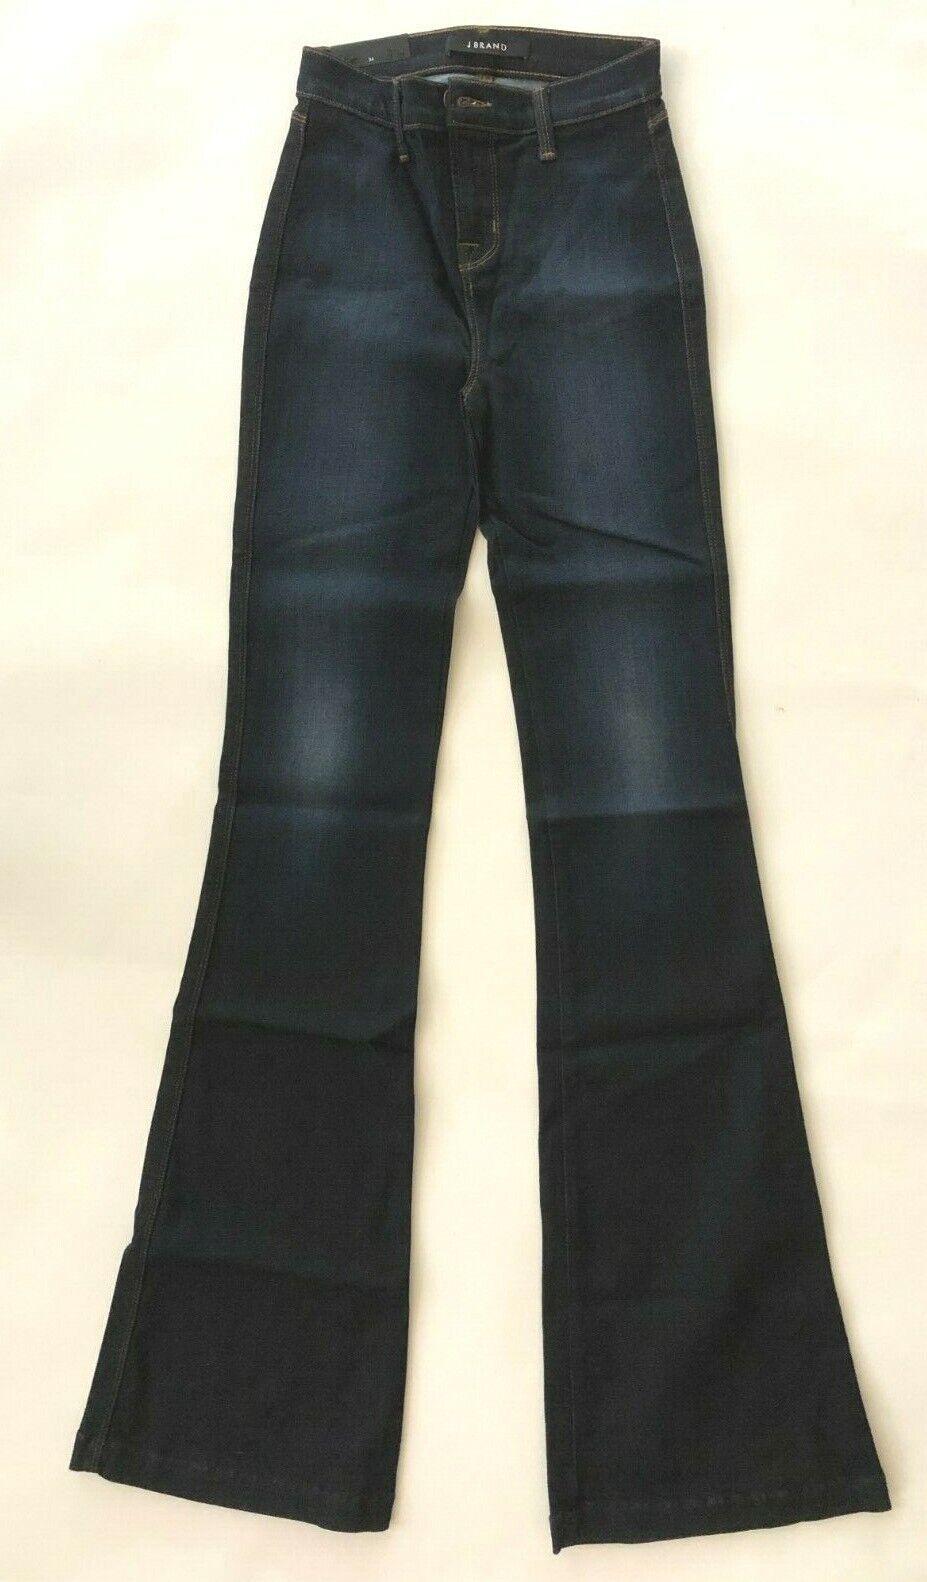 Nwt j brand halle end lumineux 822o208 bleu lawless high waist femmes jeans